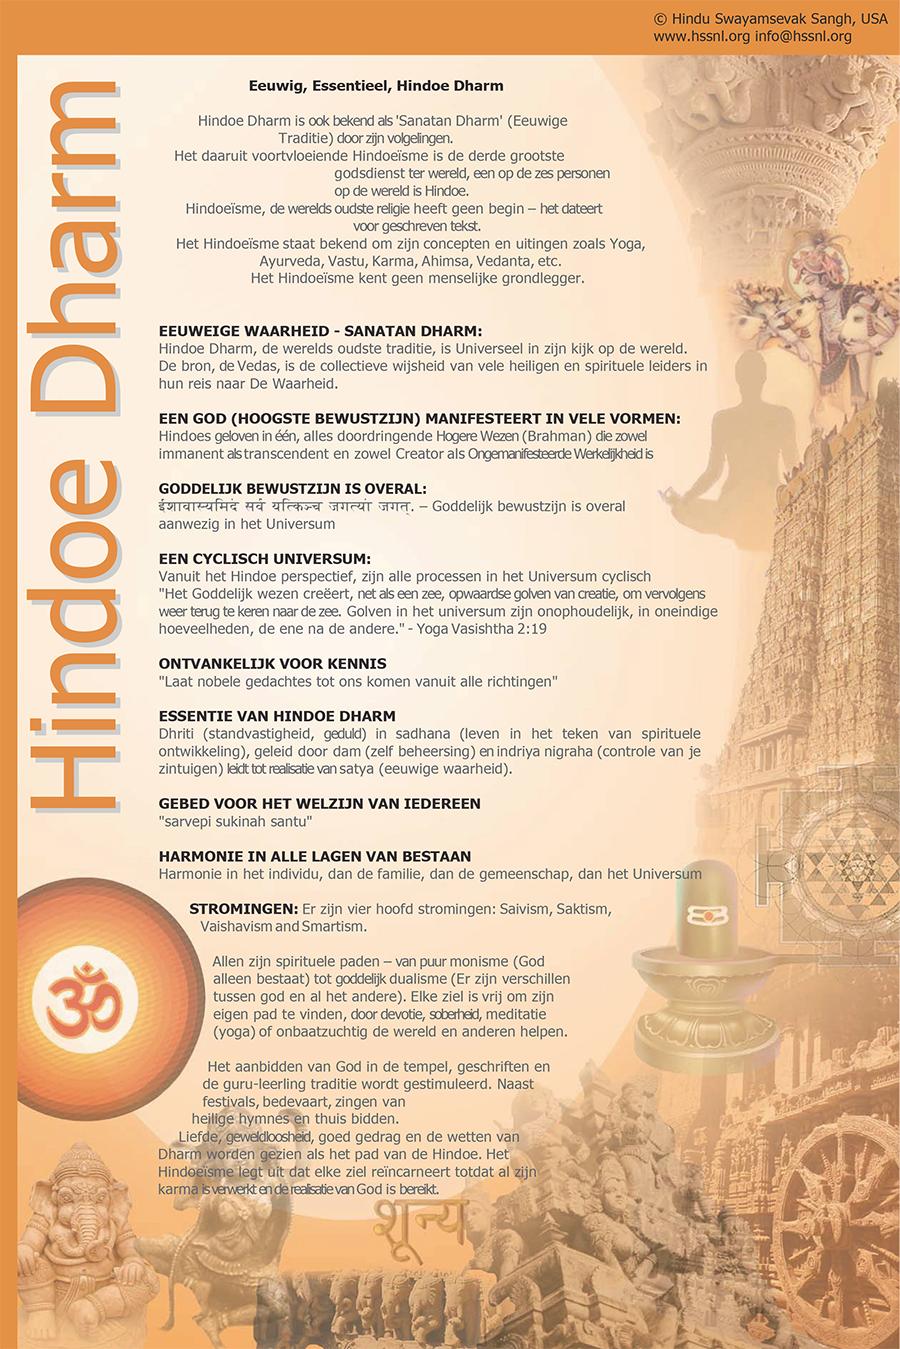 Hindoe Dharm